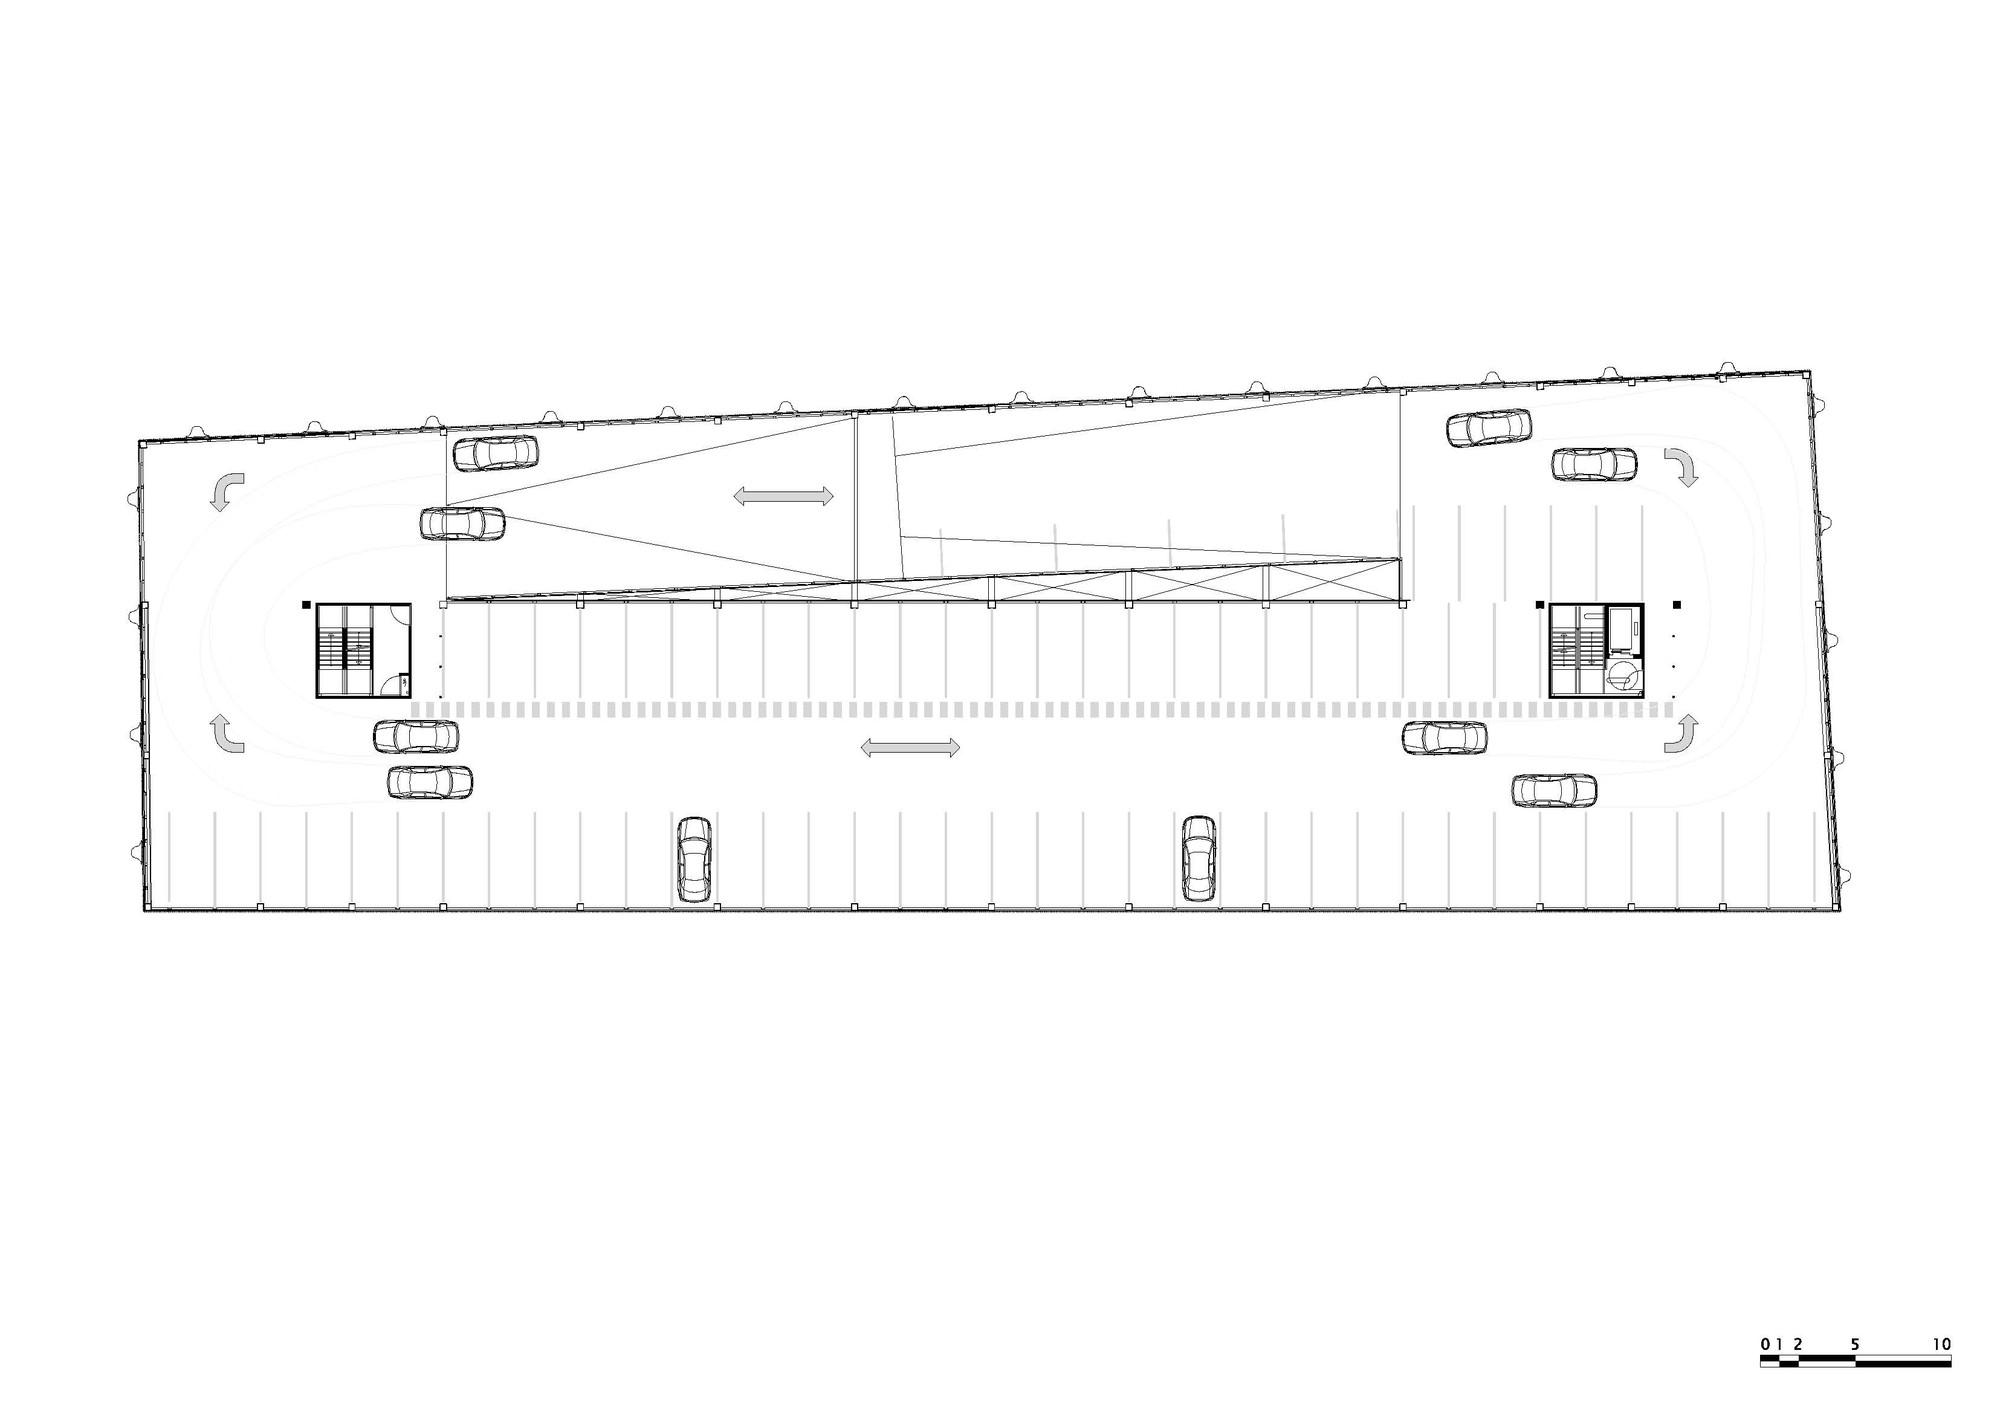 Gnome Parking Garage / Mei Architecten | ArchDaily  Gnome Parking G...